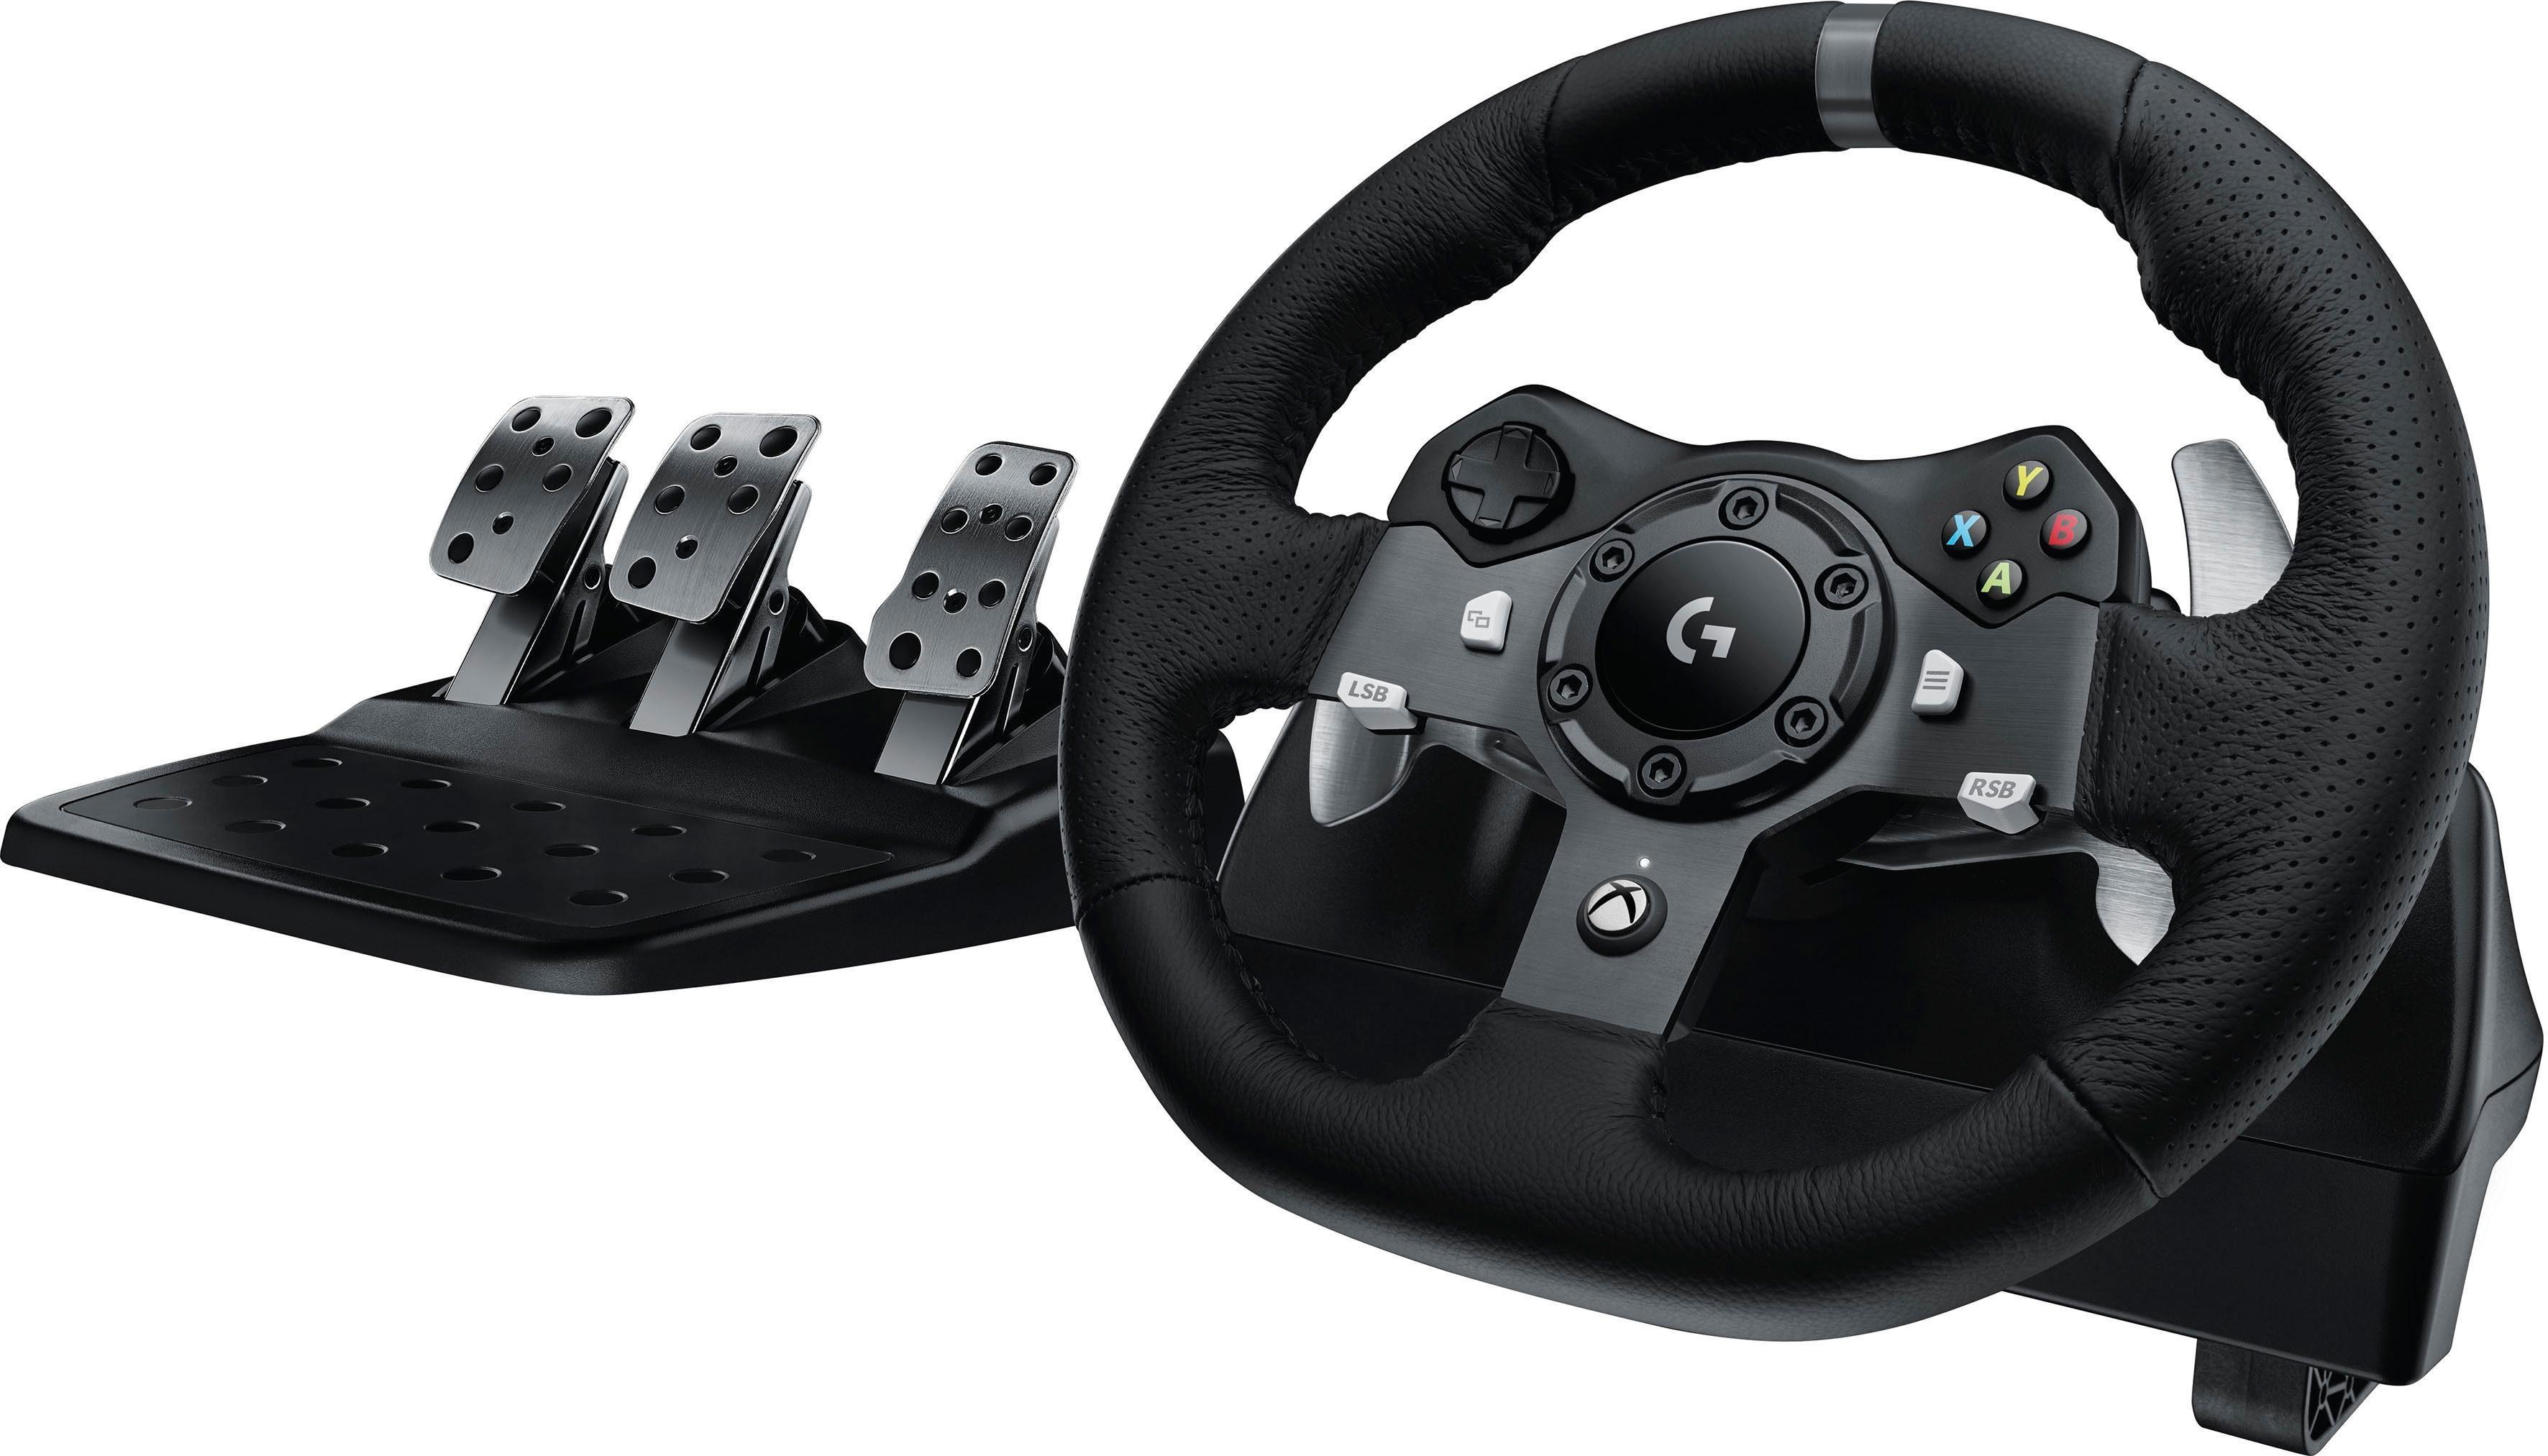 Logitech Games »G920 Driving Force Racing Wheel USB - EMEA« Gaming-Lenkrad